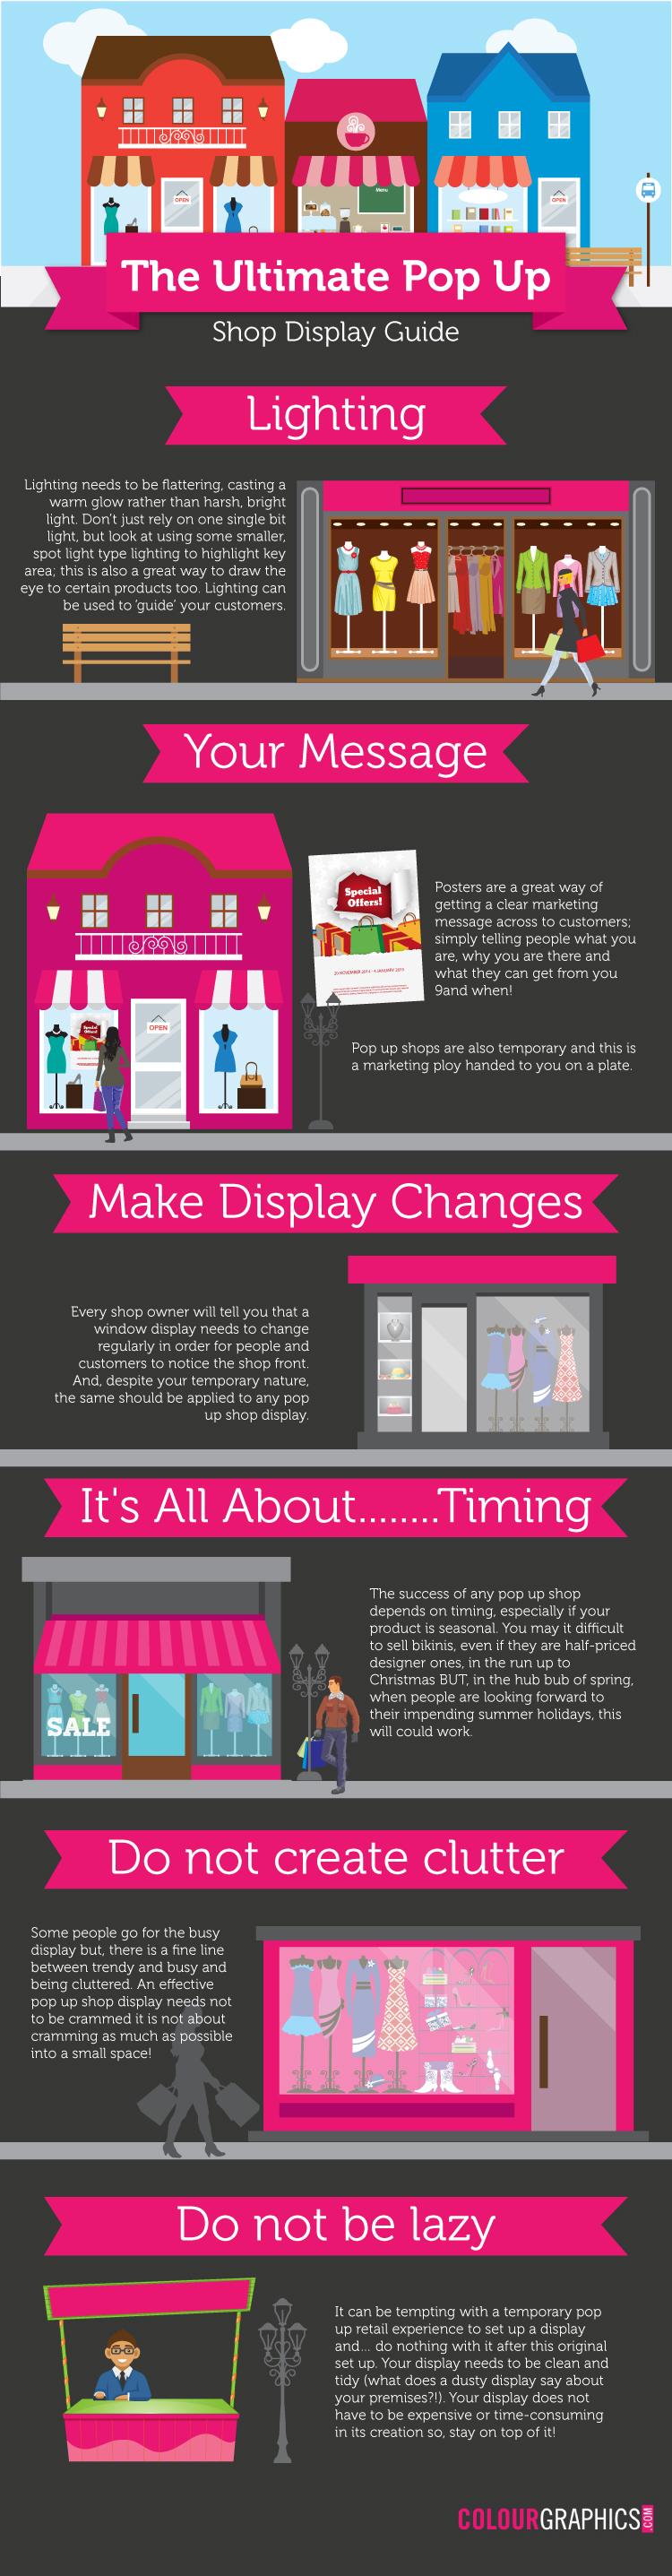 popup shop display guide